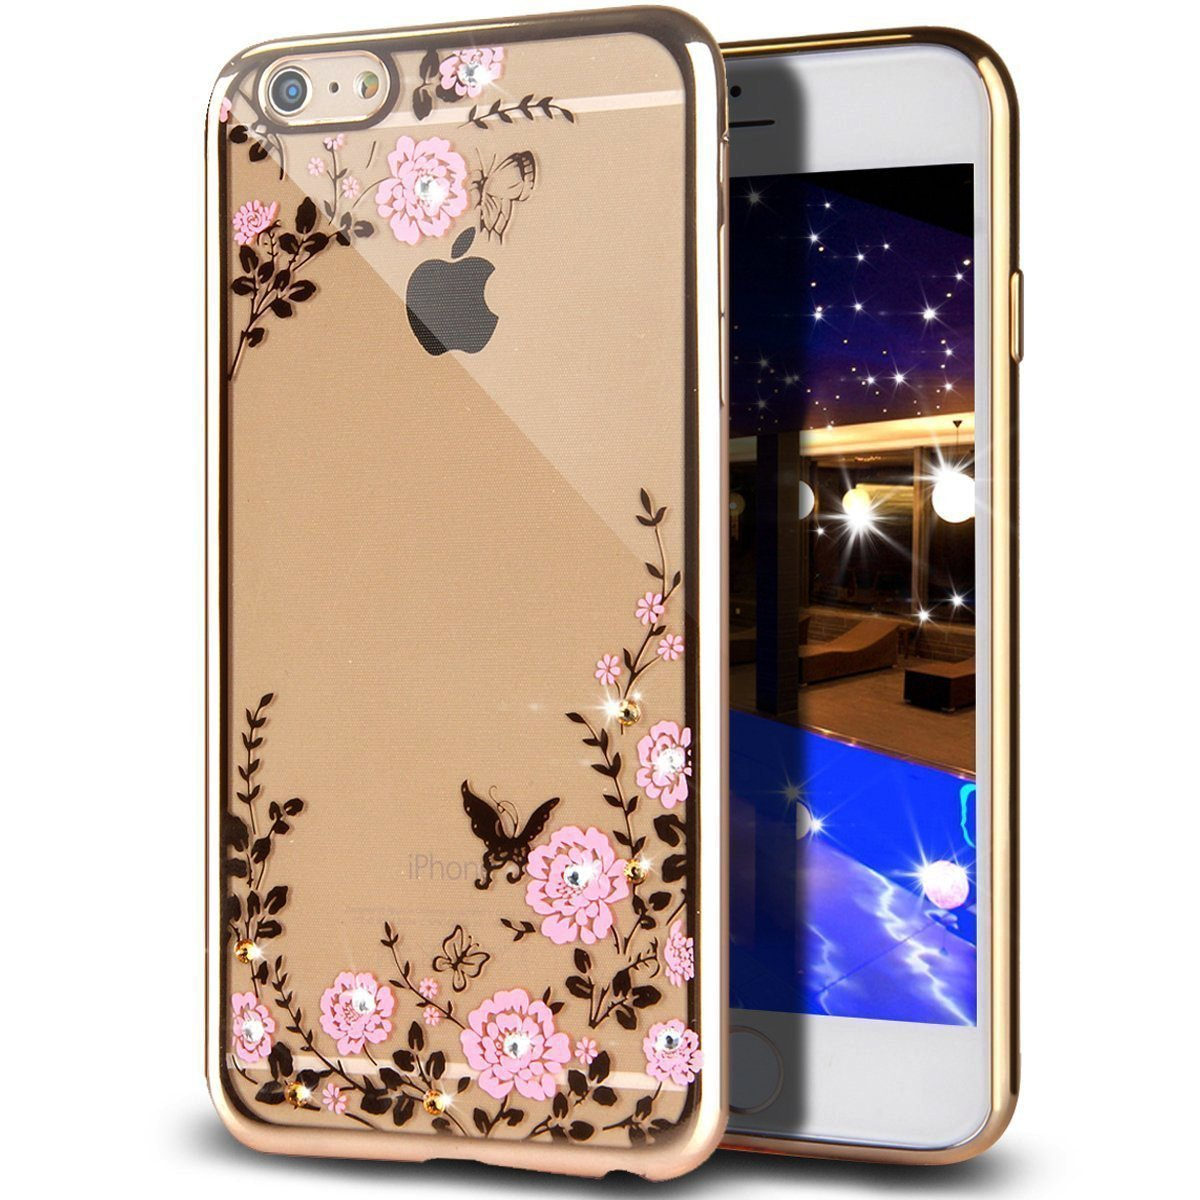 Obal / kryt Flower Garden pro iPhone 6s Plus / 6 Plus - Zlatý